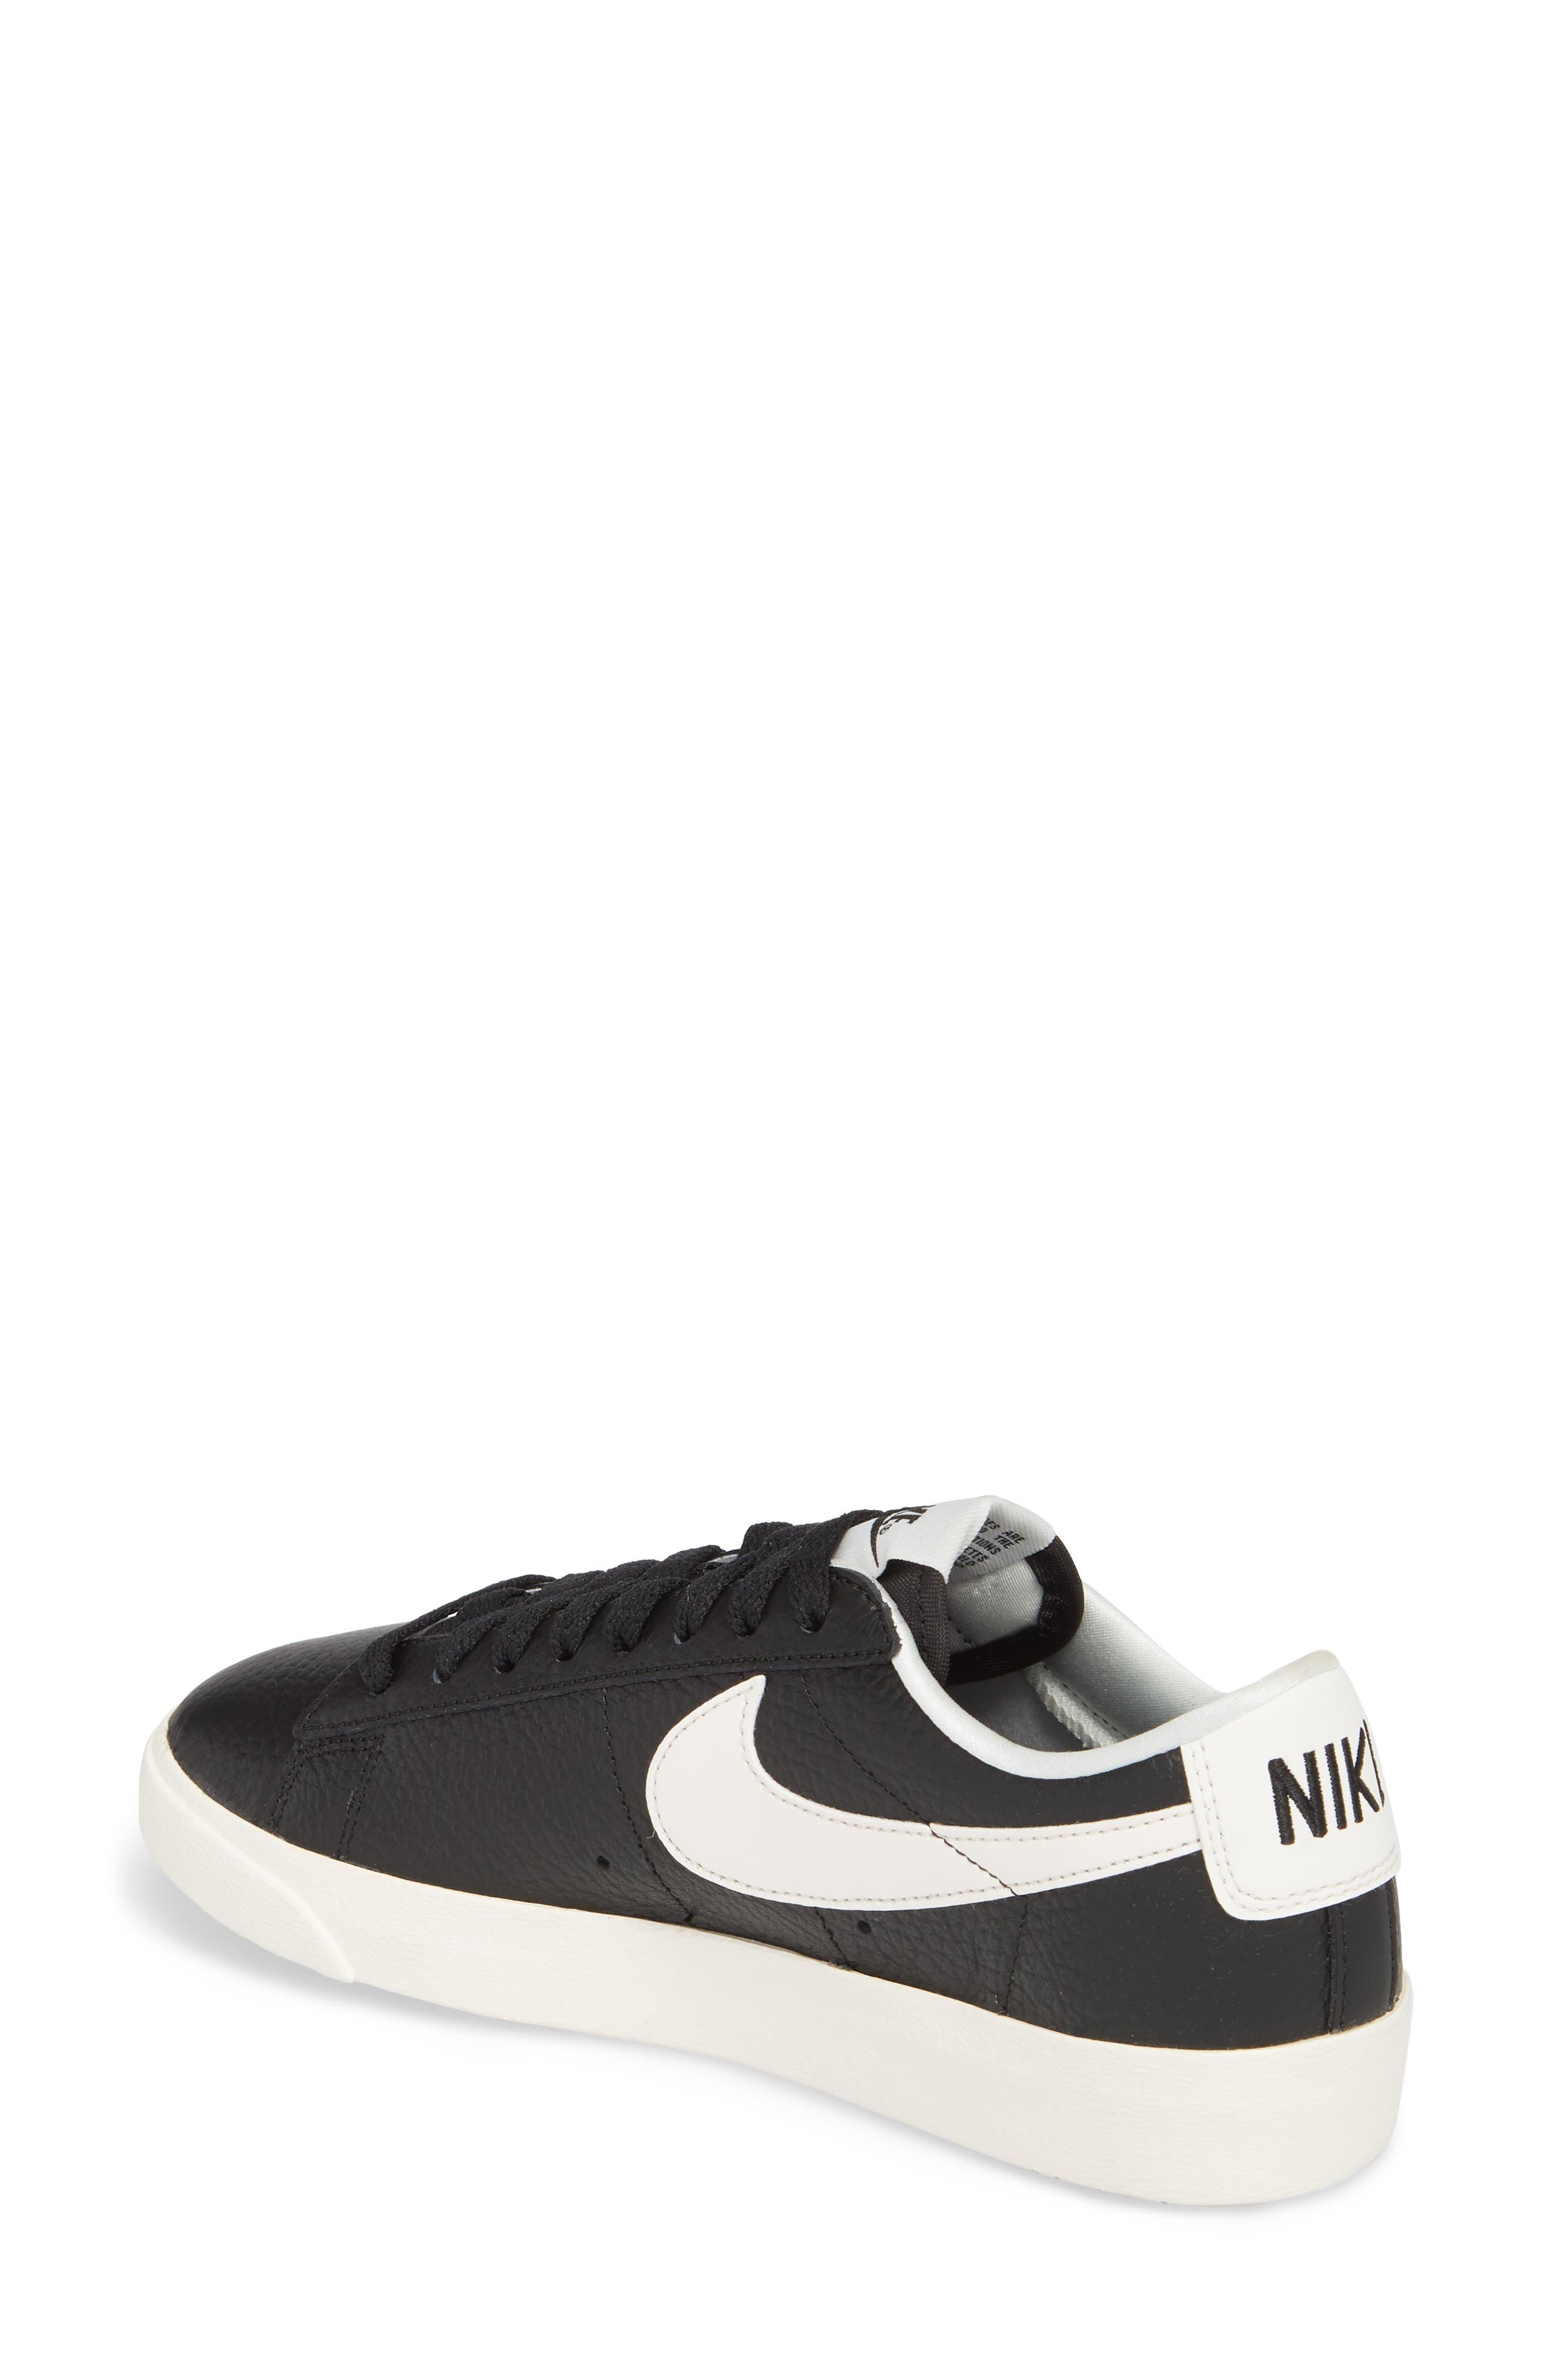 Blazer Premium Low Sneaker,                             Alternate thumbnail 2, color,                             Black/ White/ Black